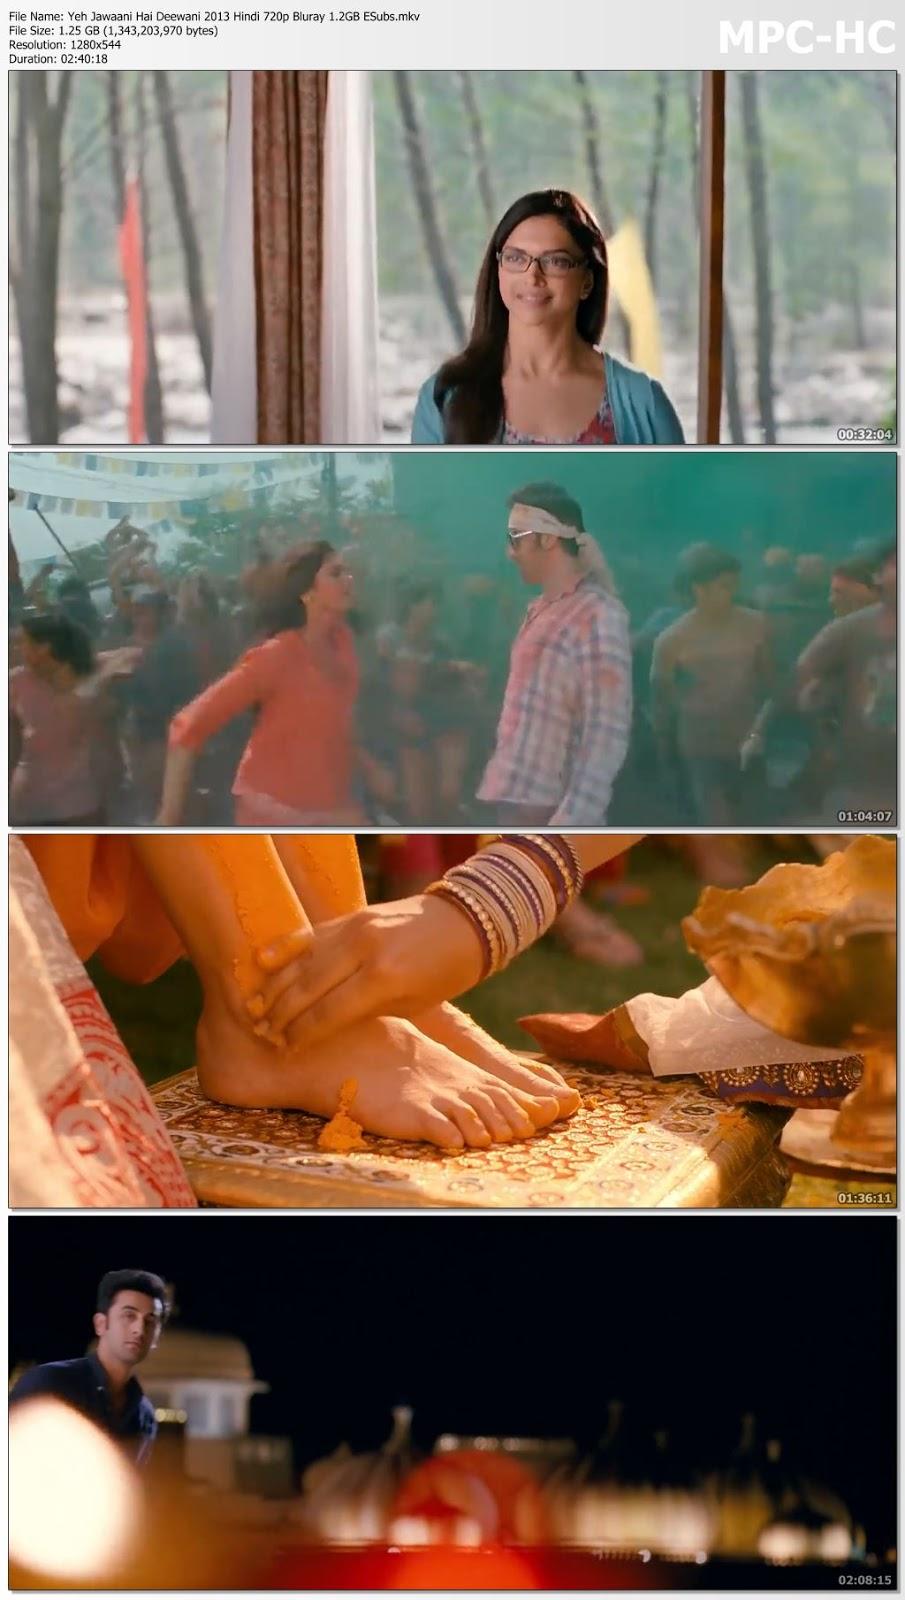 Yeh Jawaani Hai Deewani 2013 Hindi 480p BluRay 450MB ESubs Desirehub